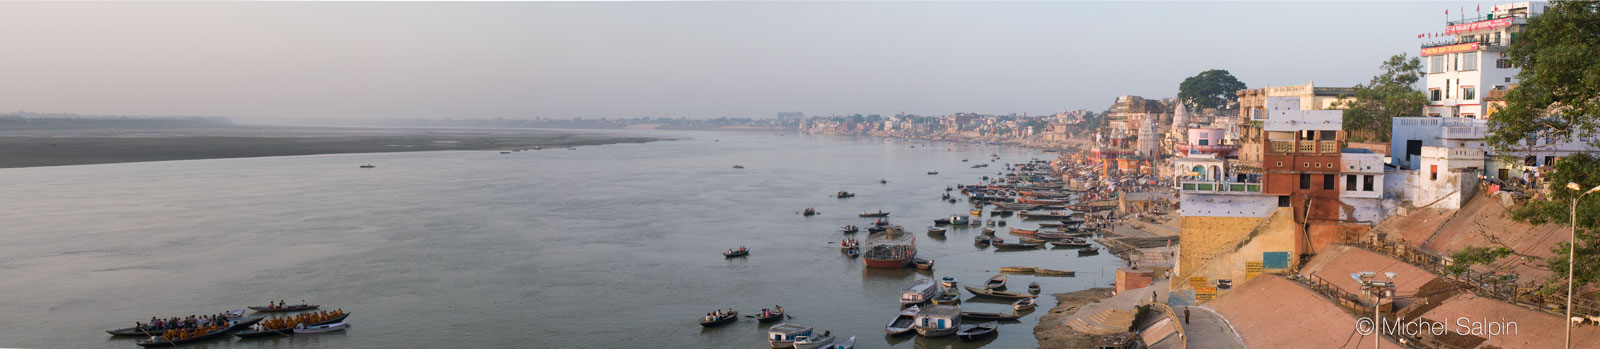 Varanasi, Inde, au bord du Gange